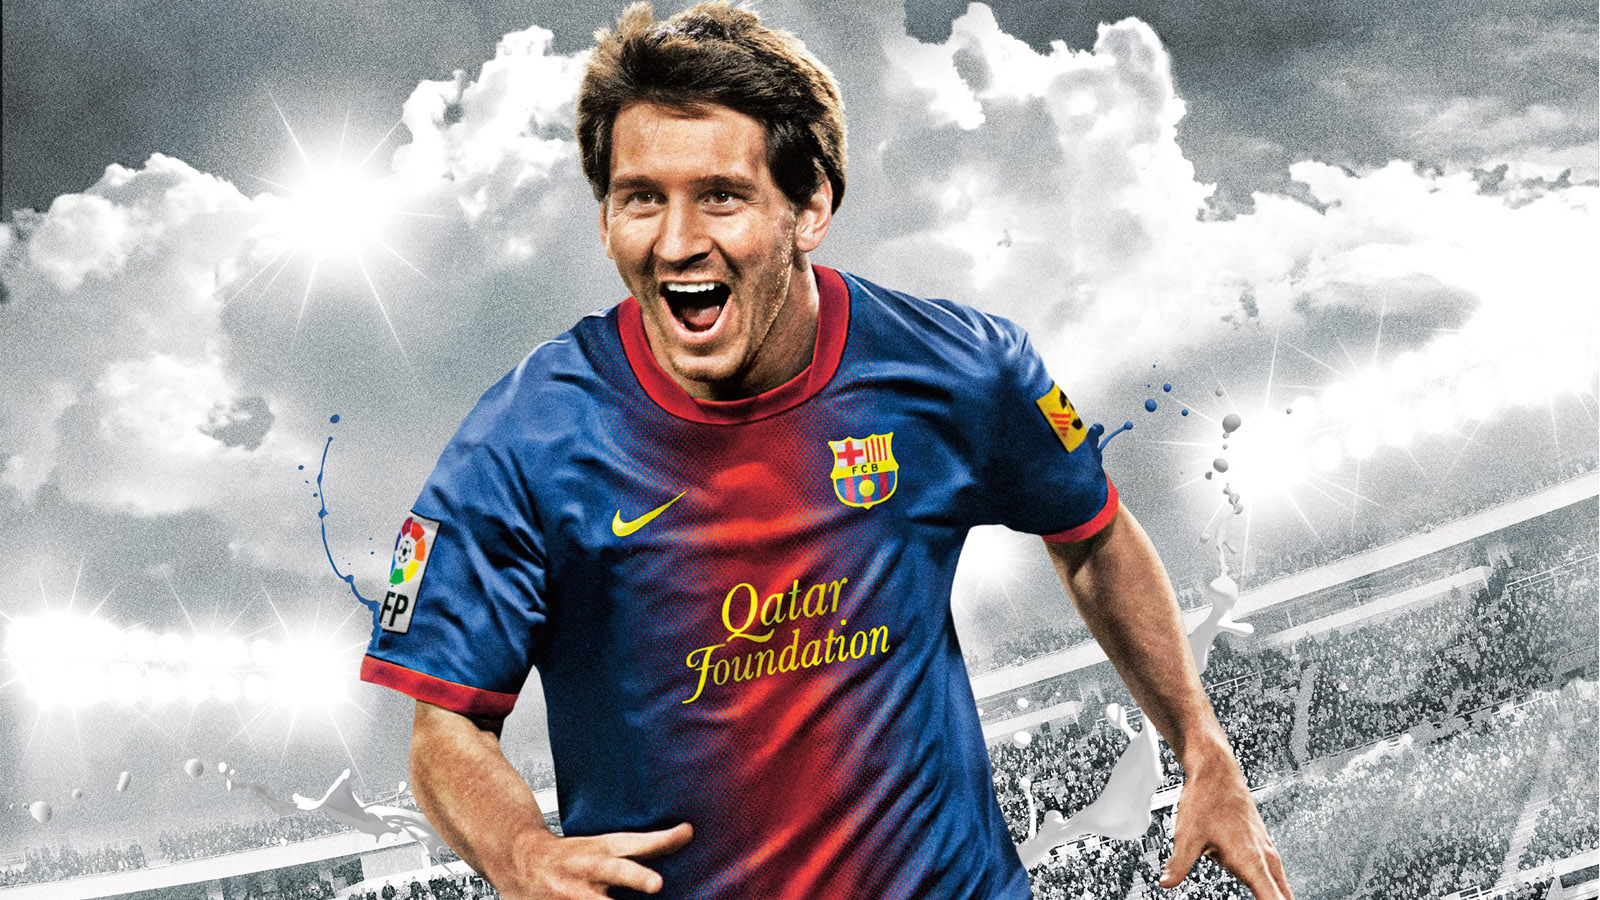 La historia del mejor jugador del mundo